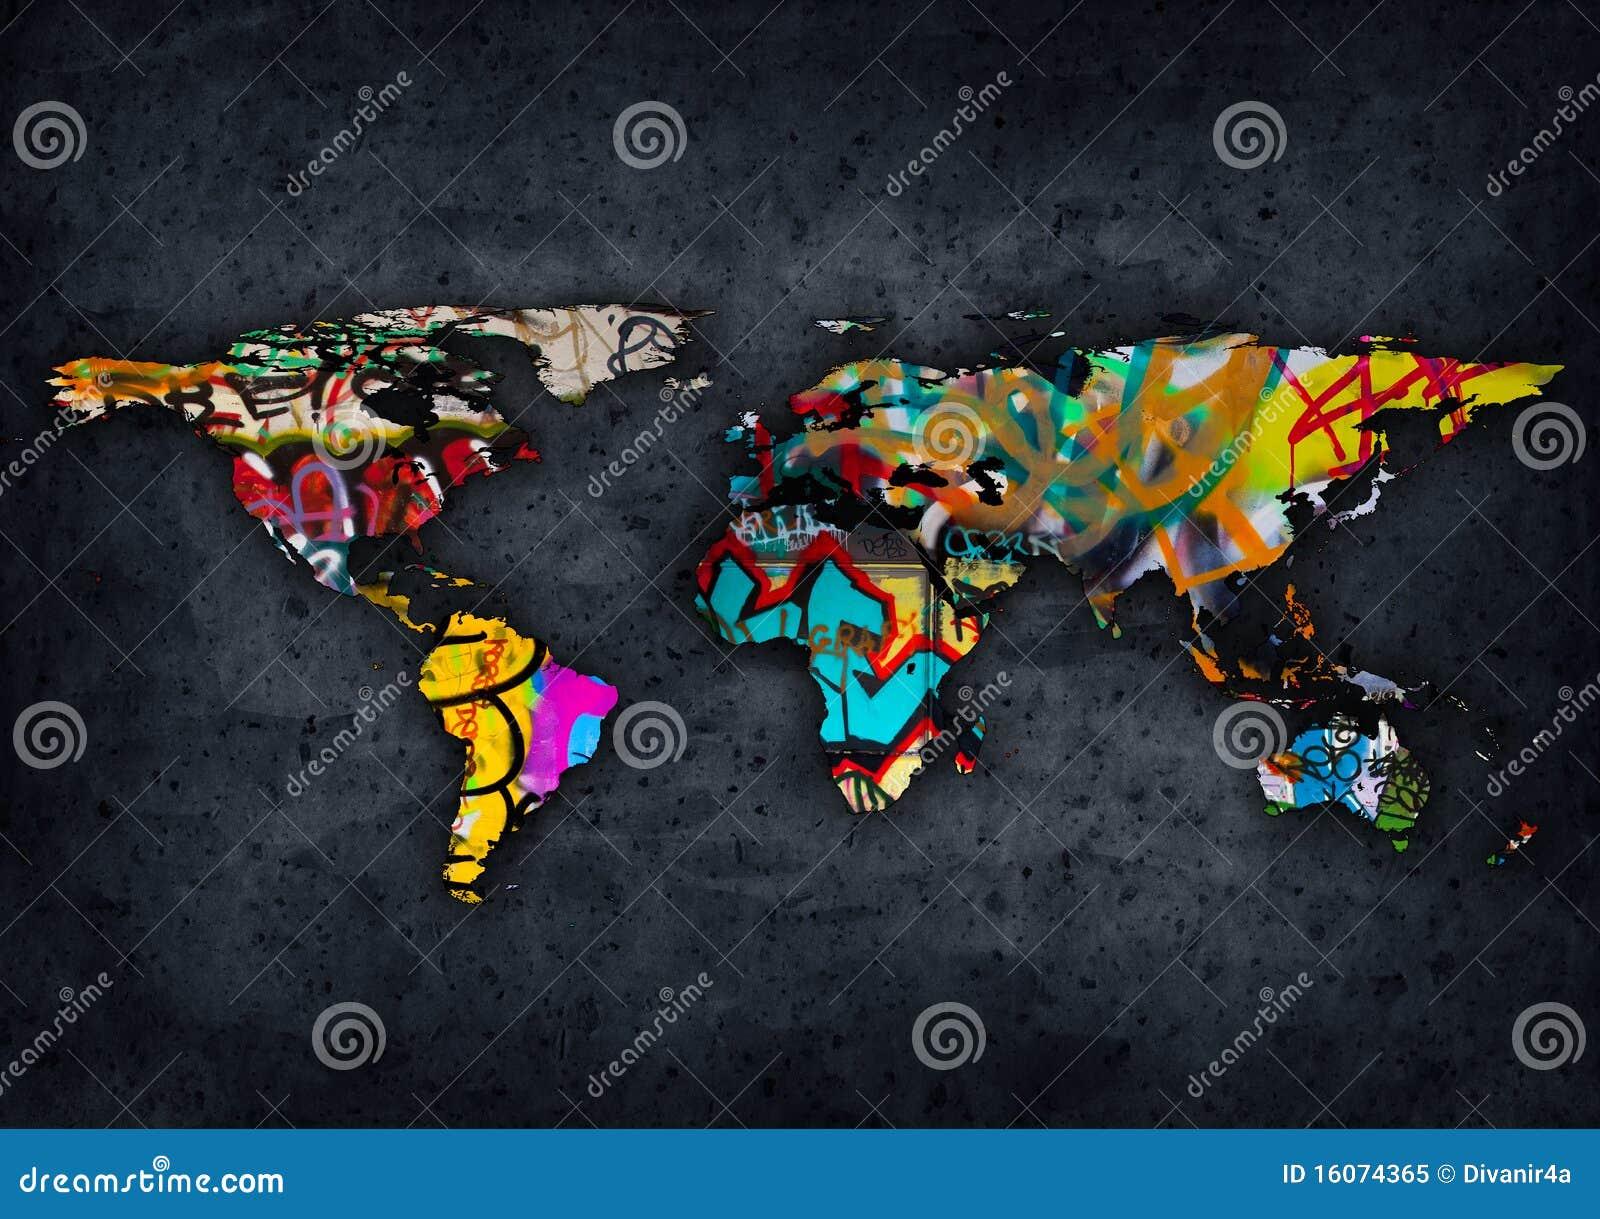 Graffit world map stock illustration illustration of urban 16074365 graffit world map gumiabroncs Choice Image